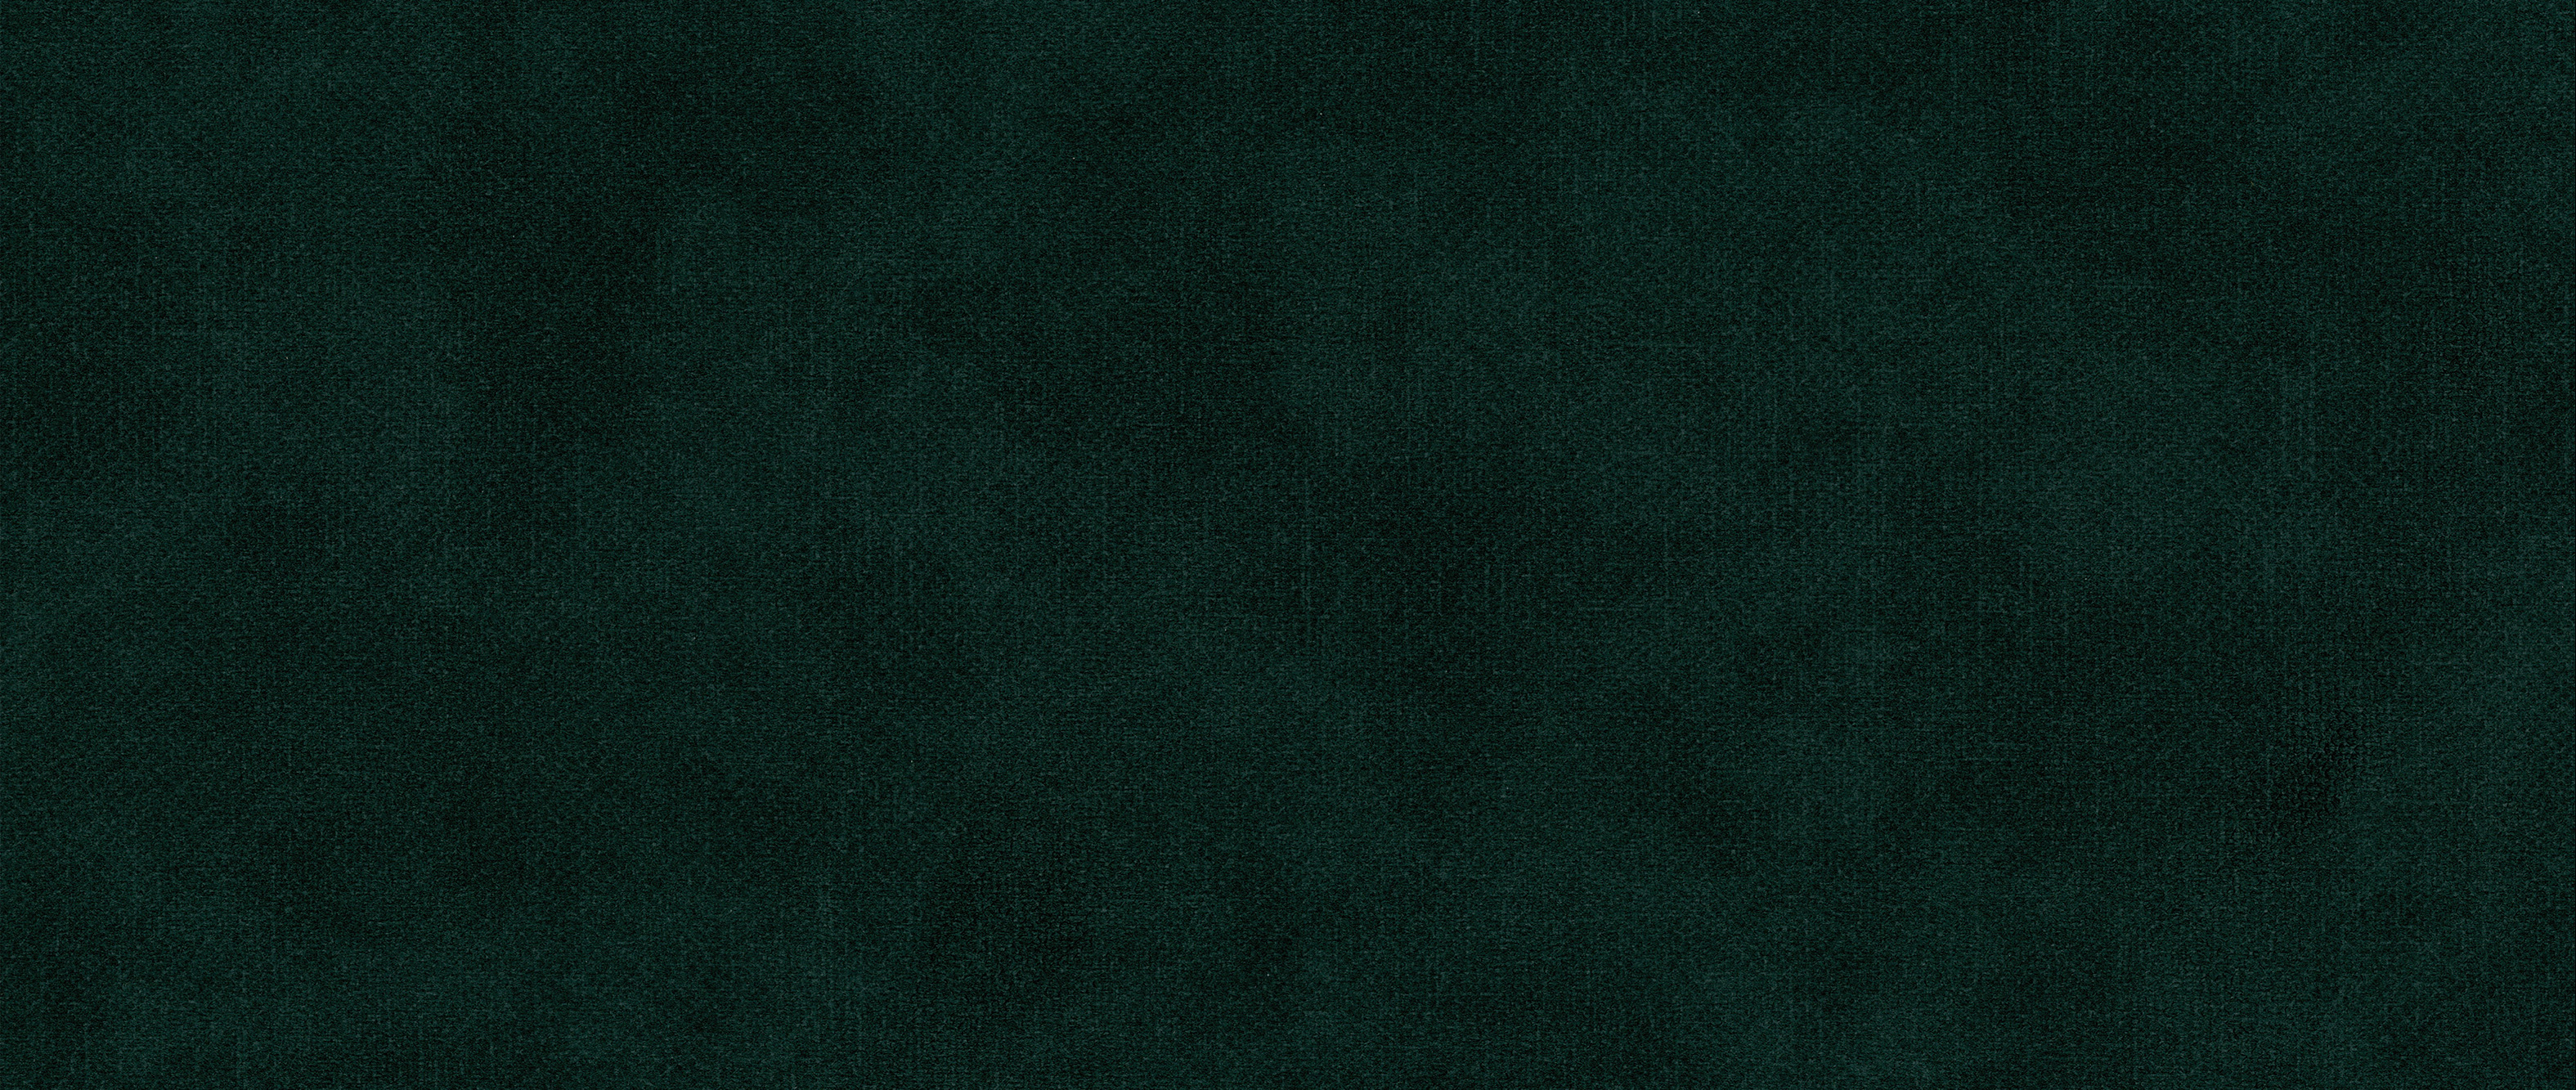 Kolor skóry: terra 39 plaskie